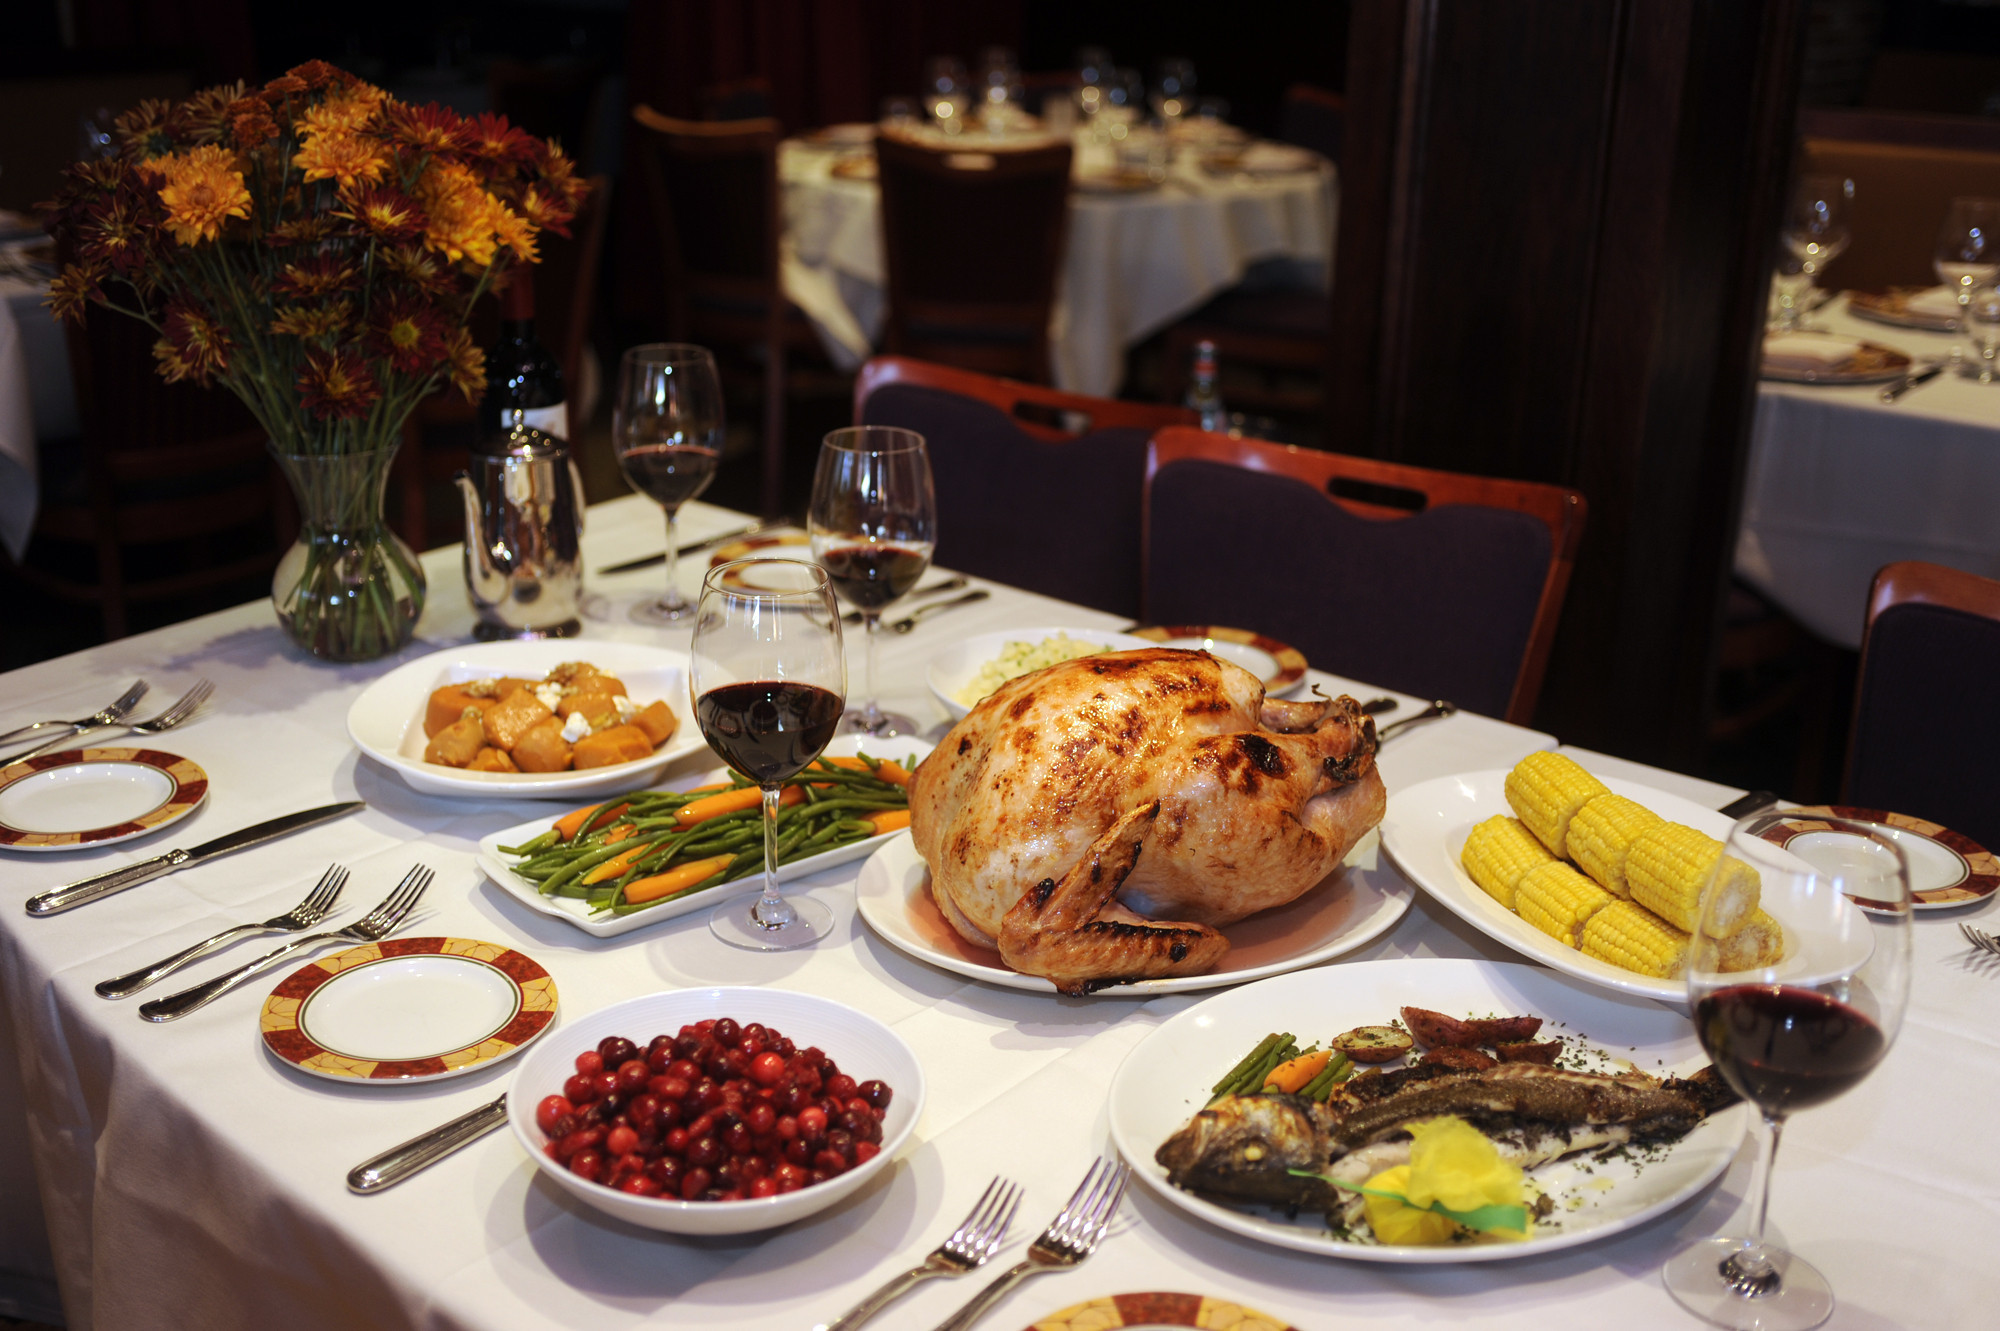 Restaurant Thanksgiving Dinner  Where to dine on Thanksgiving Day in Baltimore